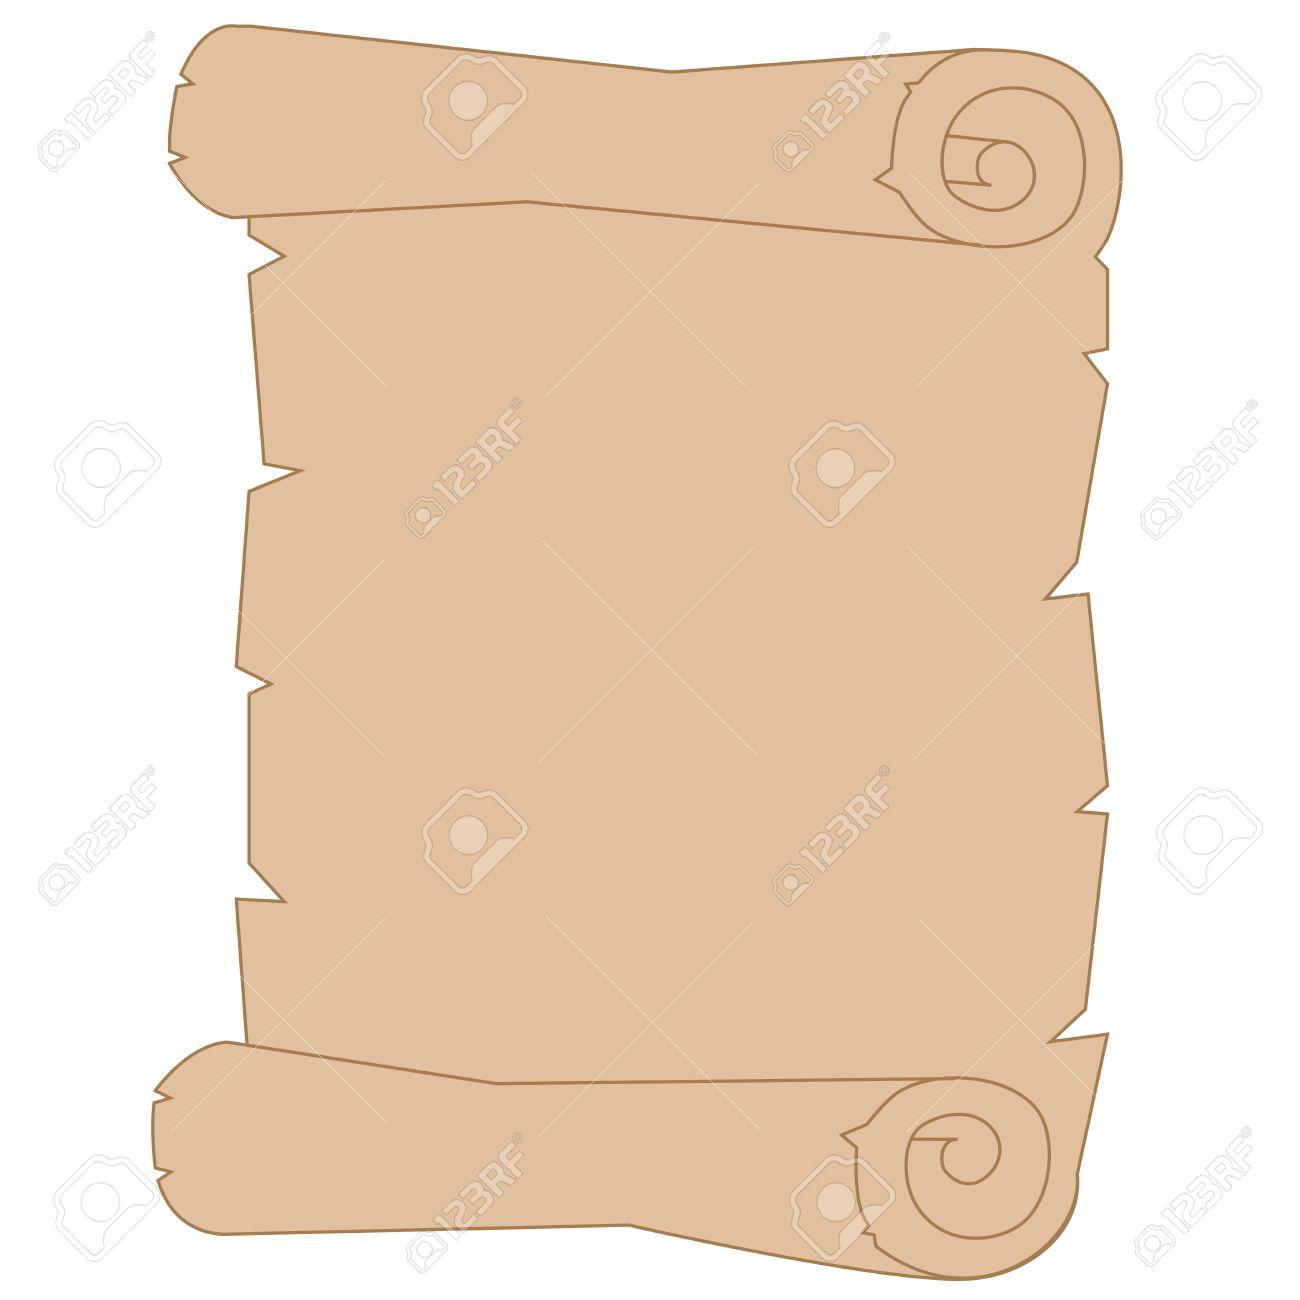 Blank Treasure Map Royalty Free Cliparts Vectors And Stock